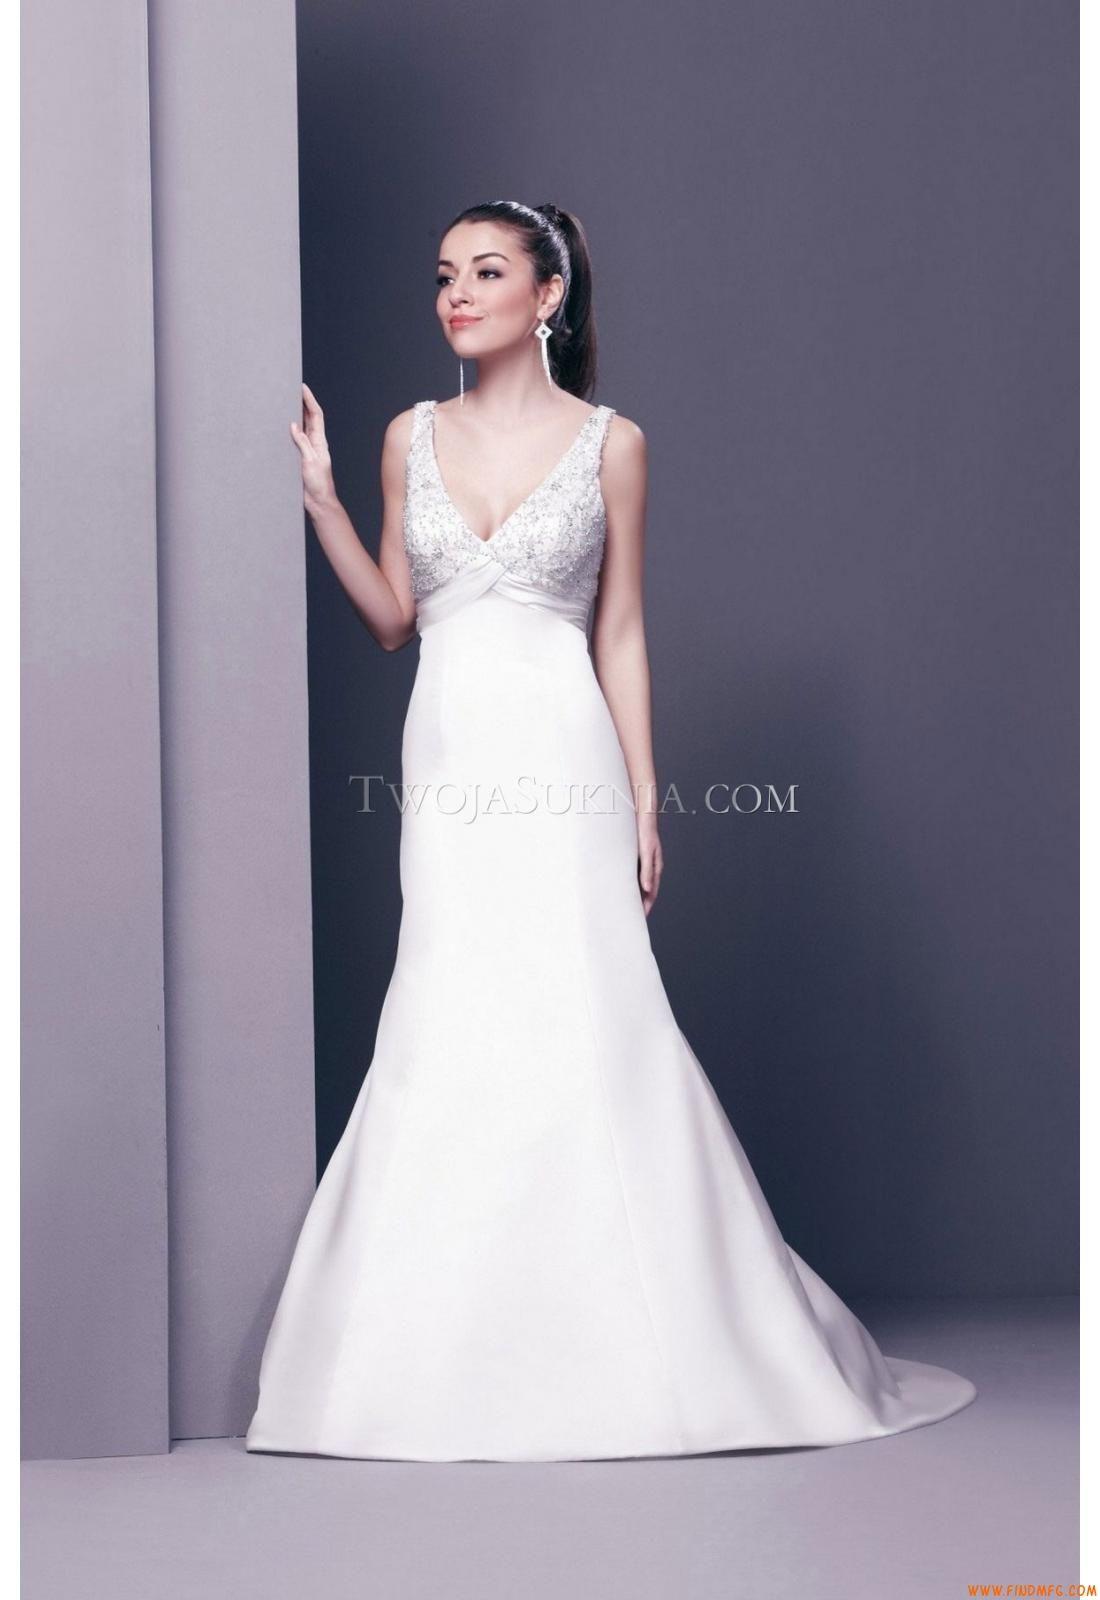 Dresses Bridal Vestidos De Noiva DZage D31103 2012